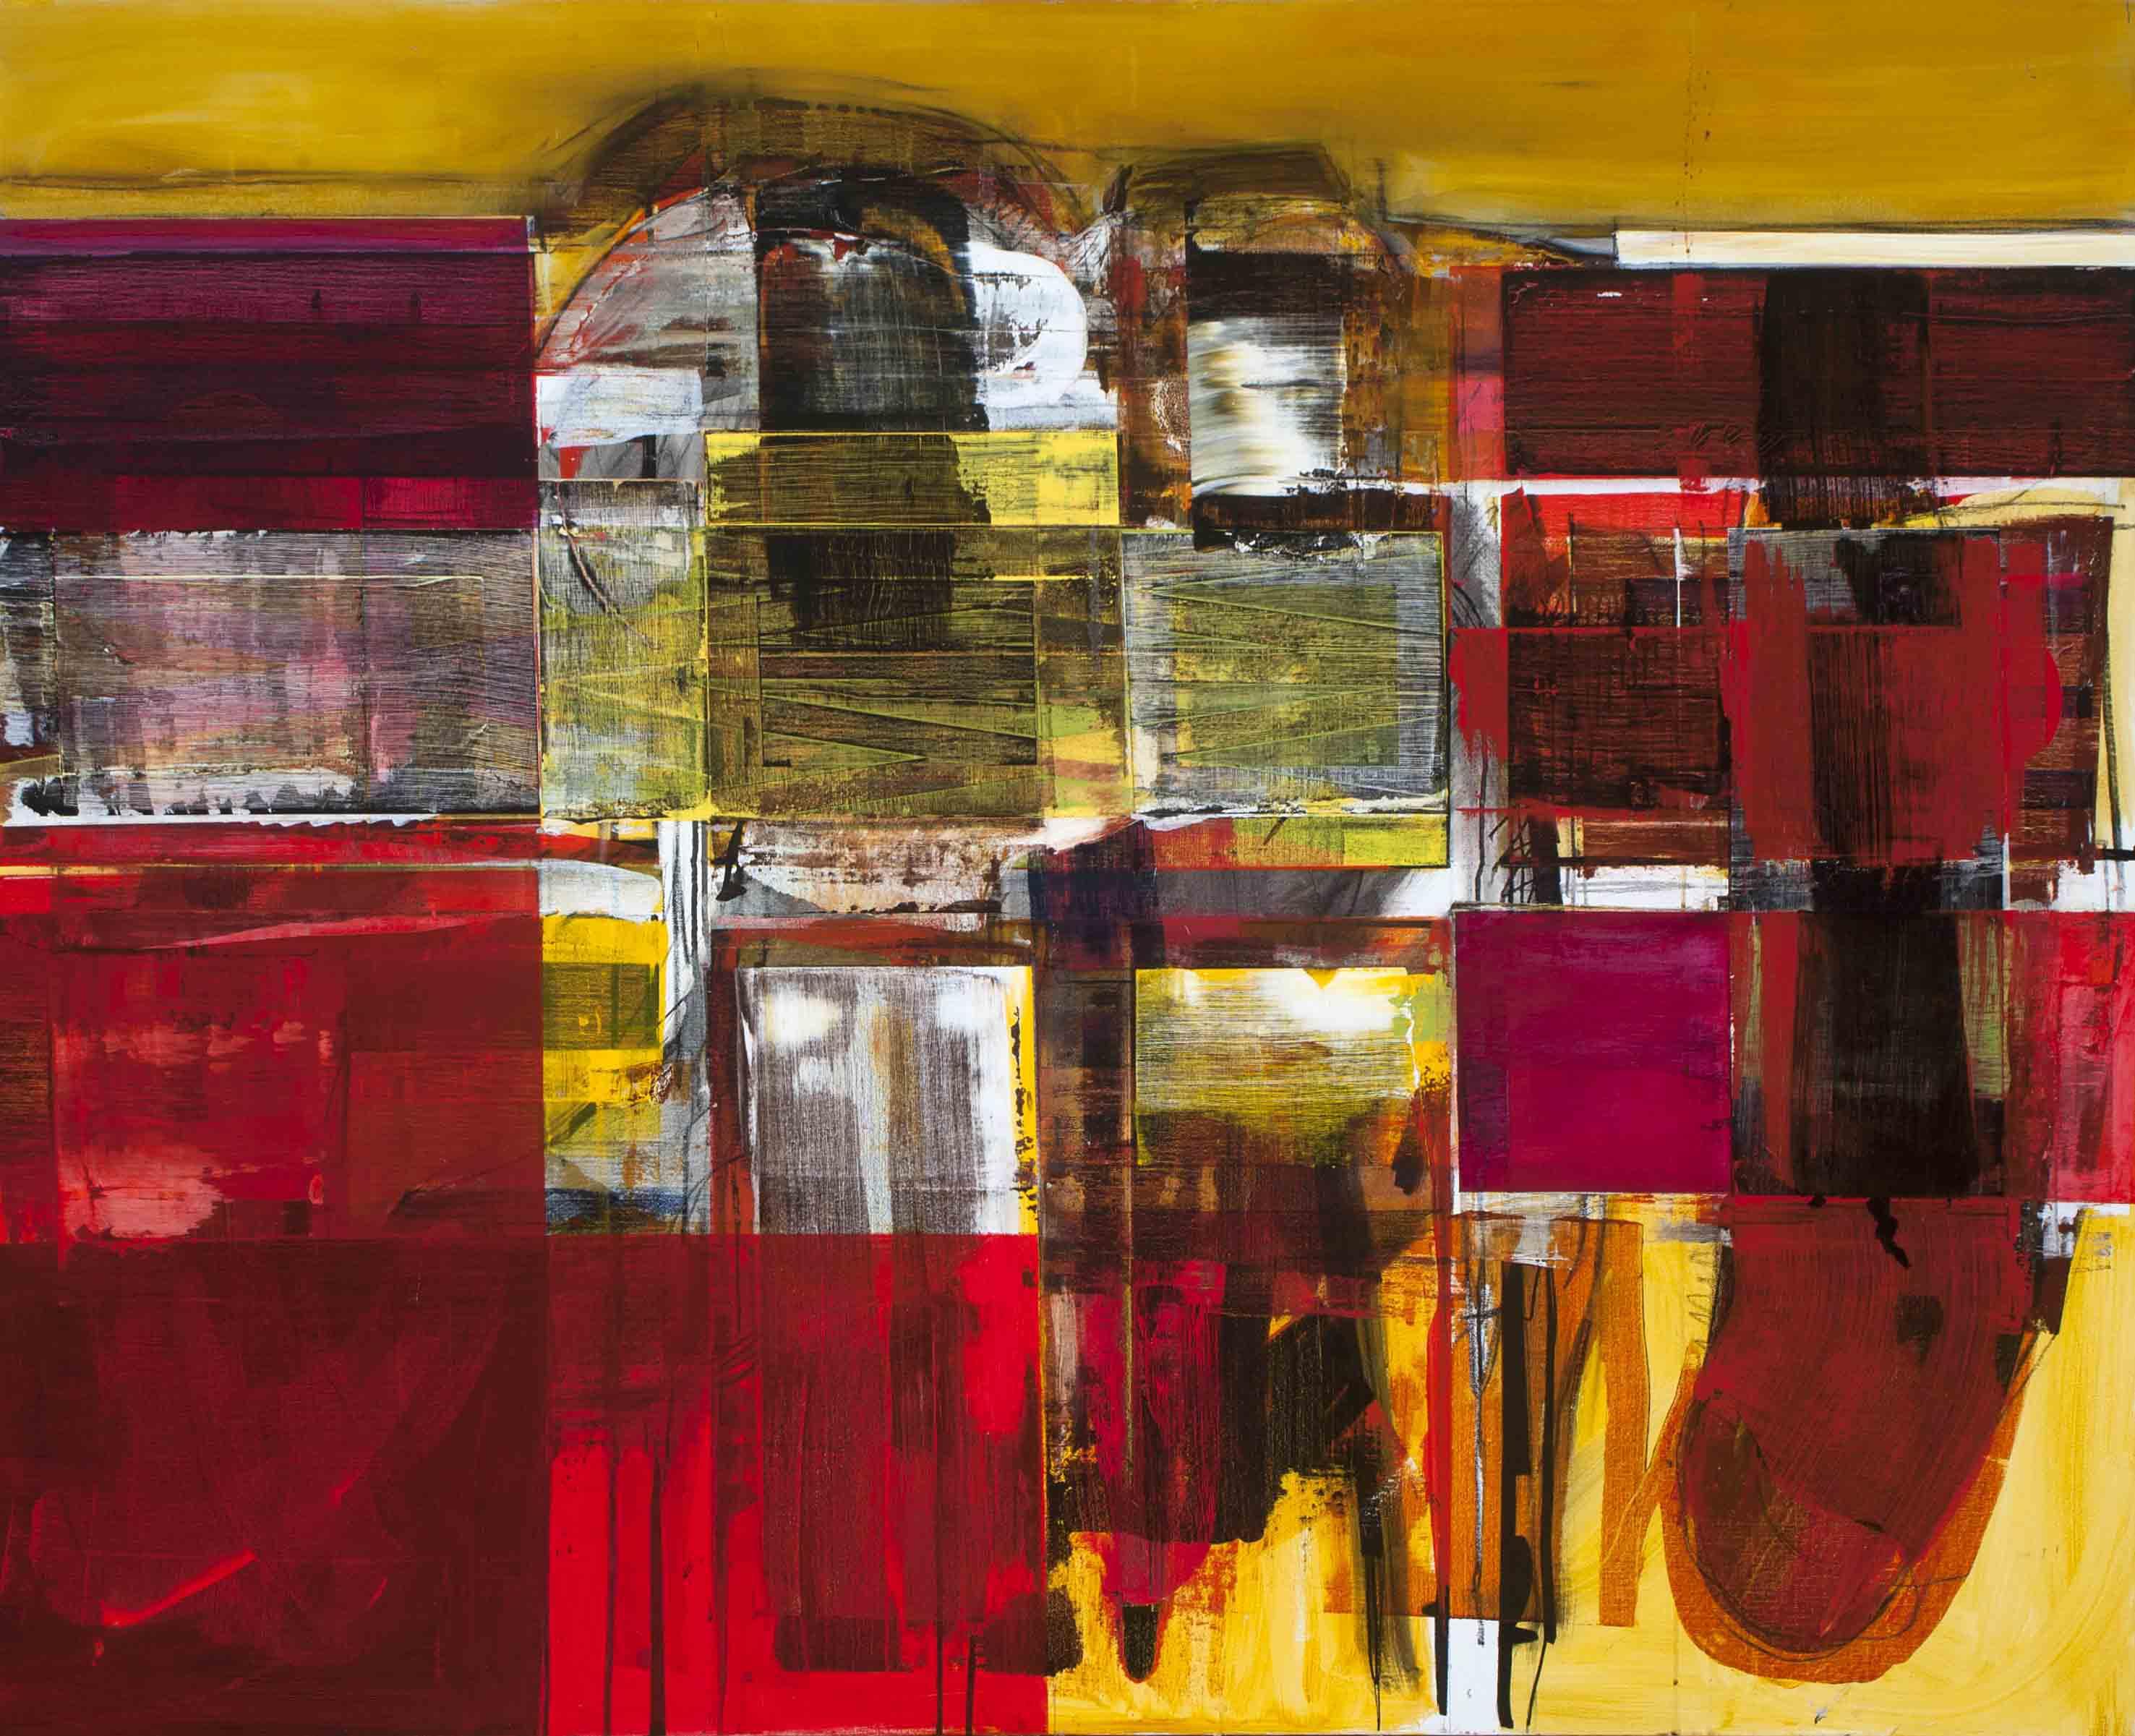 John Waller Mallee 1, 2014 Oil, acrlylic, graphite, pastel, charcoal on linen 122 x 152 cm